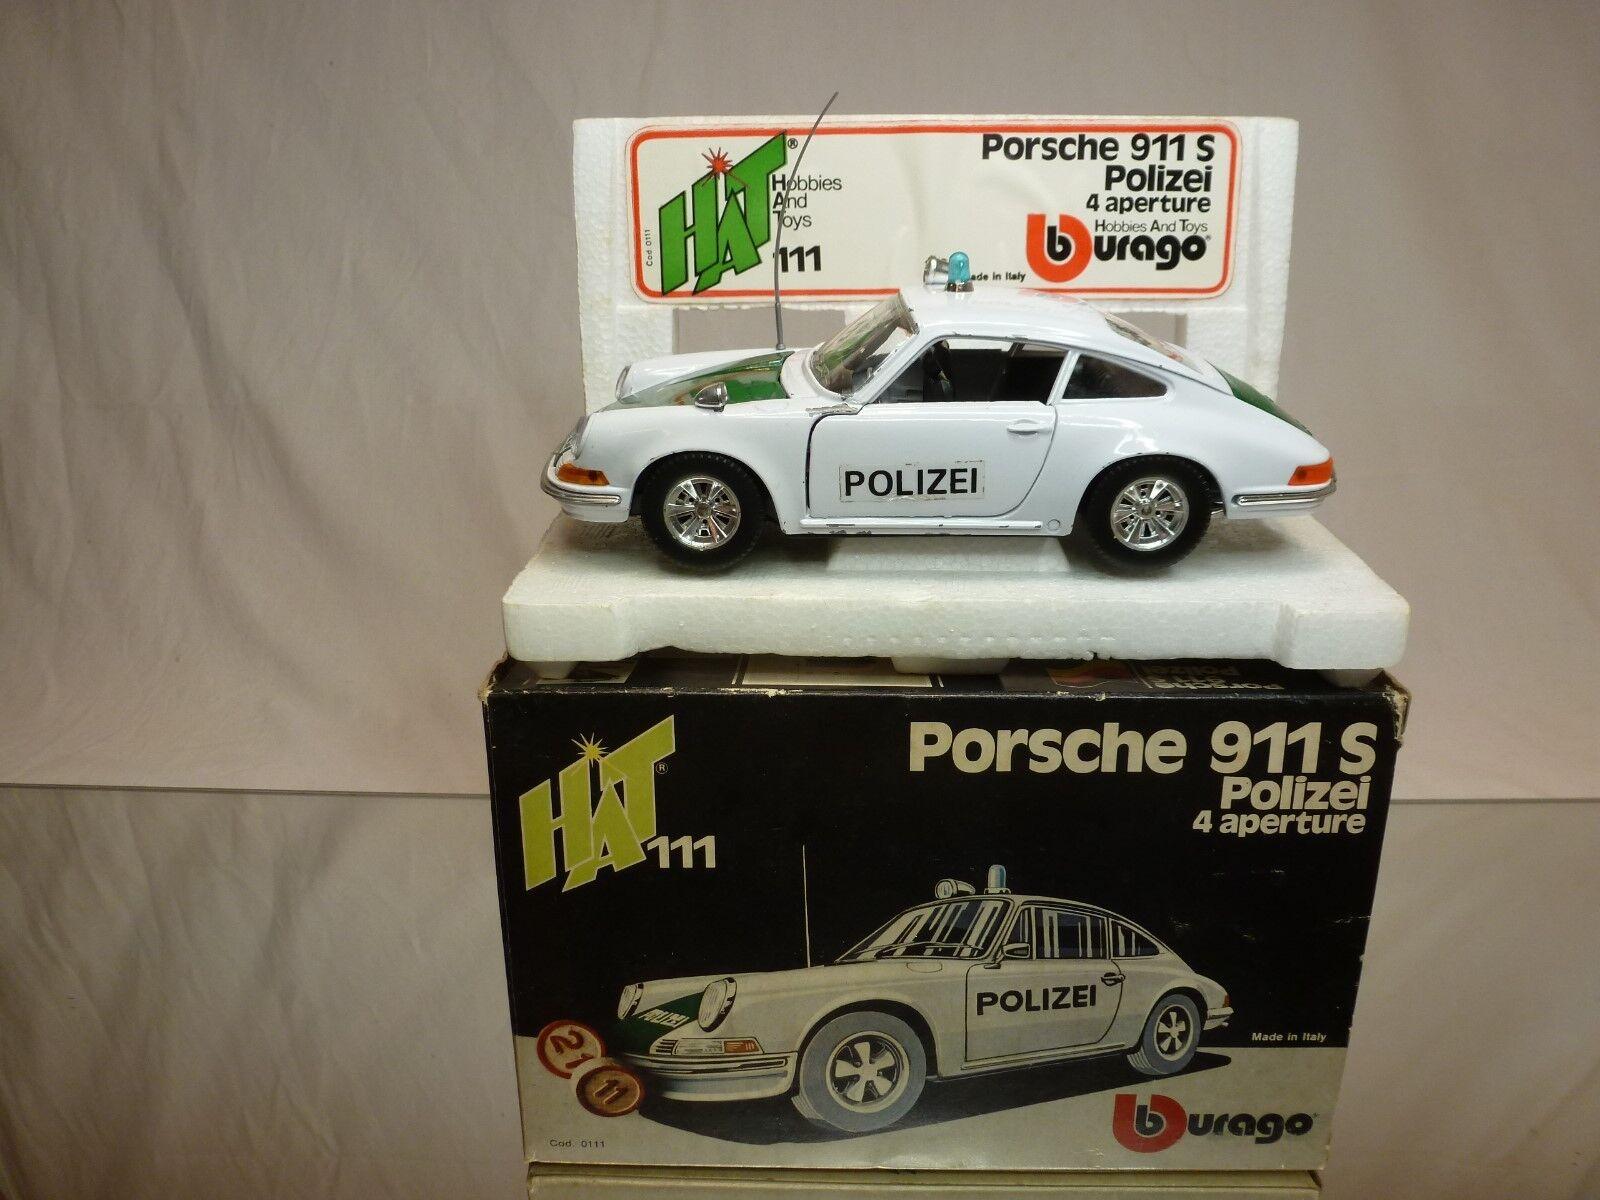 BBURAGO 1 24 PORSCHE 911 S POLIZEI 0111   -  GOOD CONDITION IN BOX - VERY  RARE